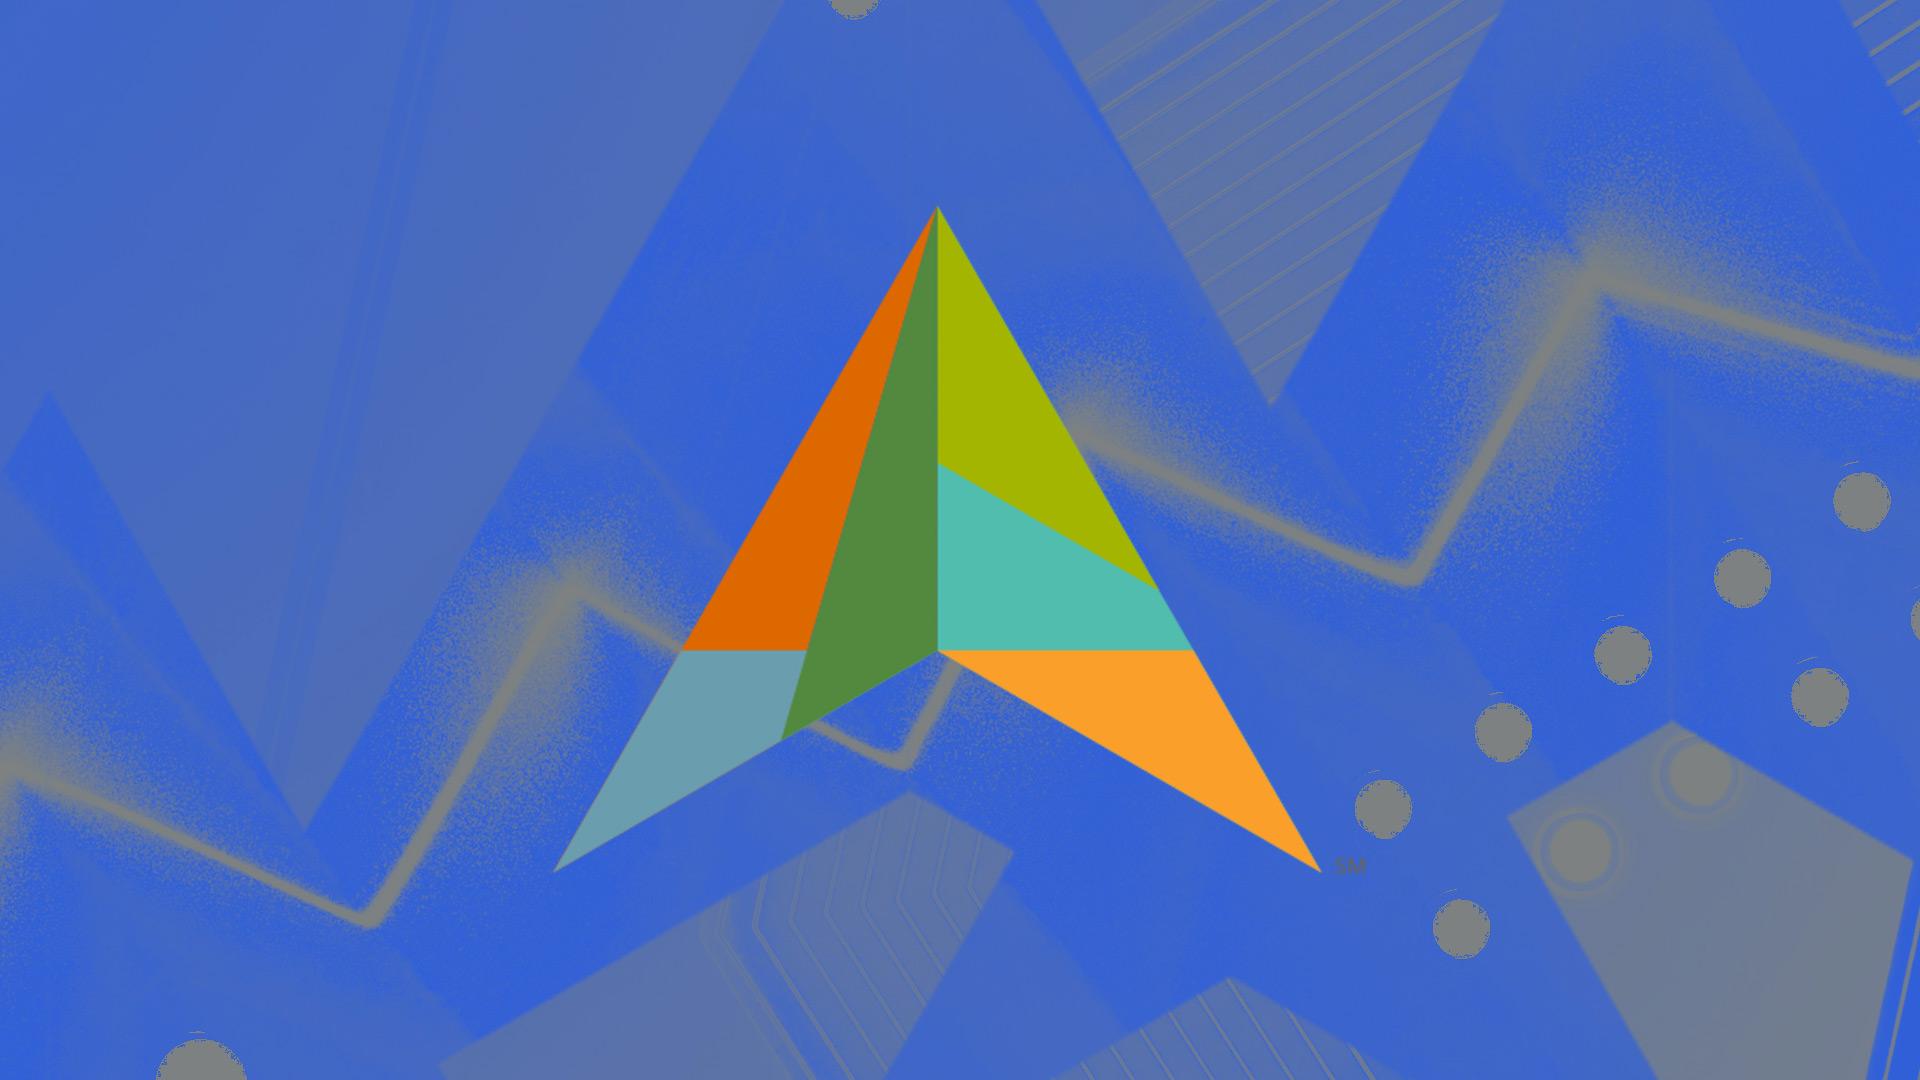 Fidelity unveils digital asset analytics tool for institutional investors